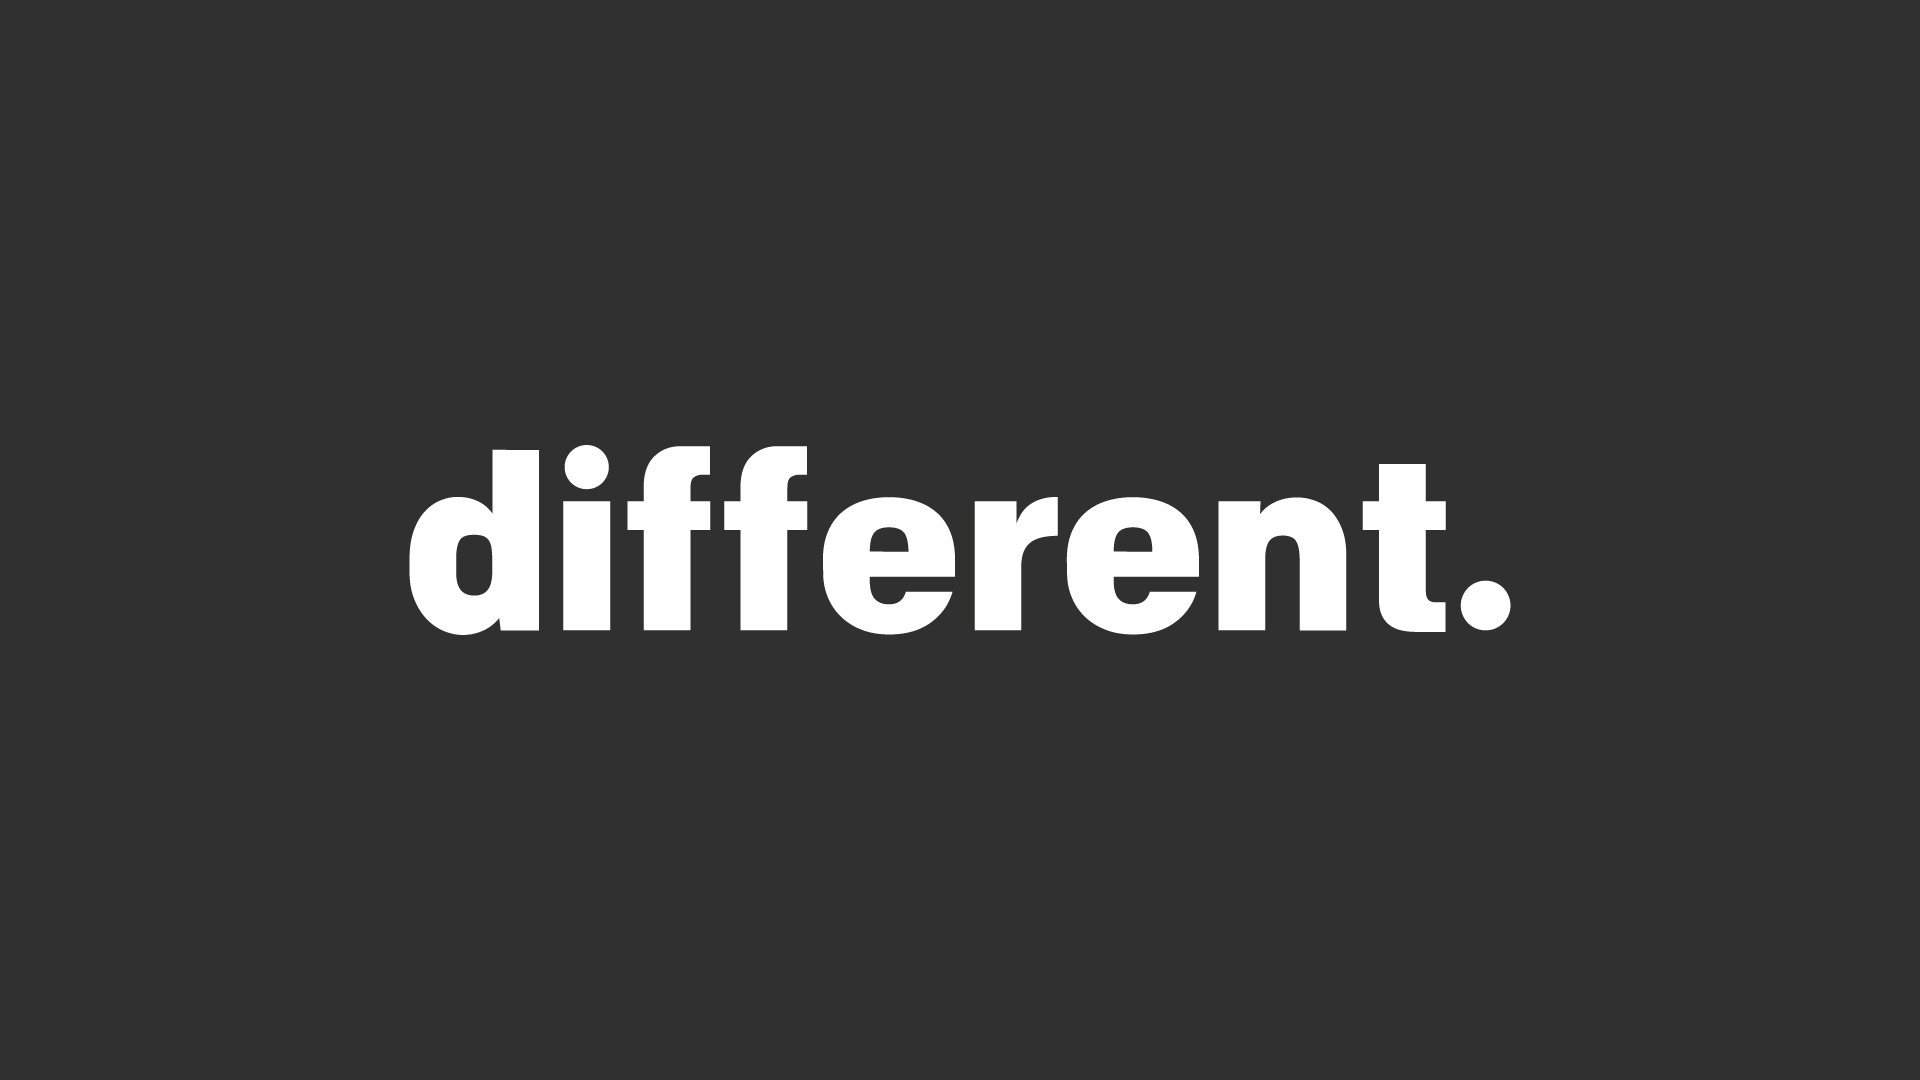 DIfferent-01.jpg